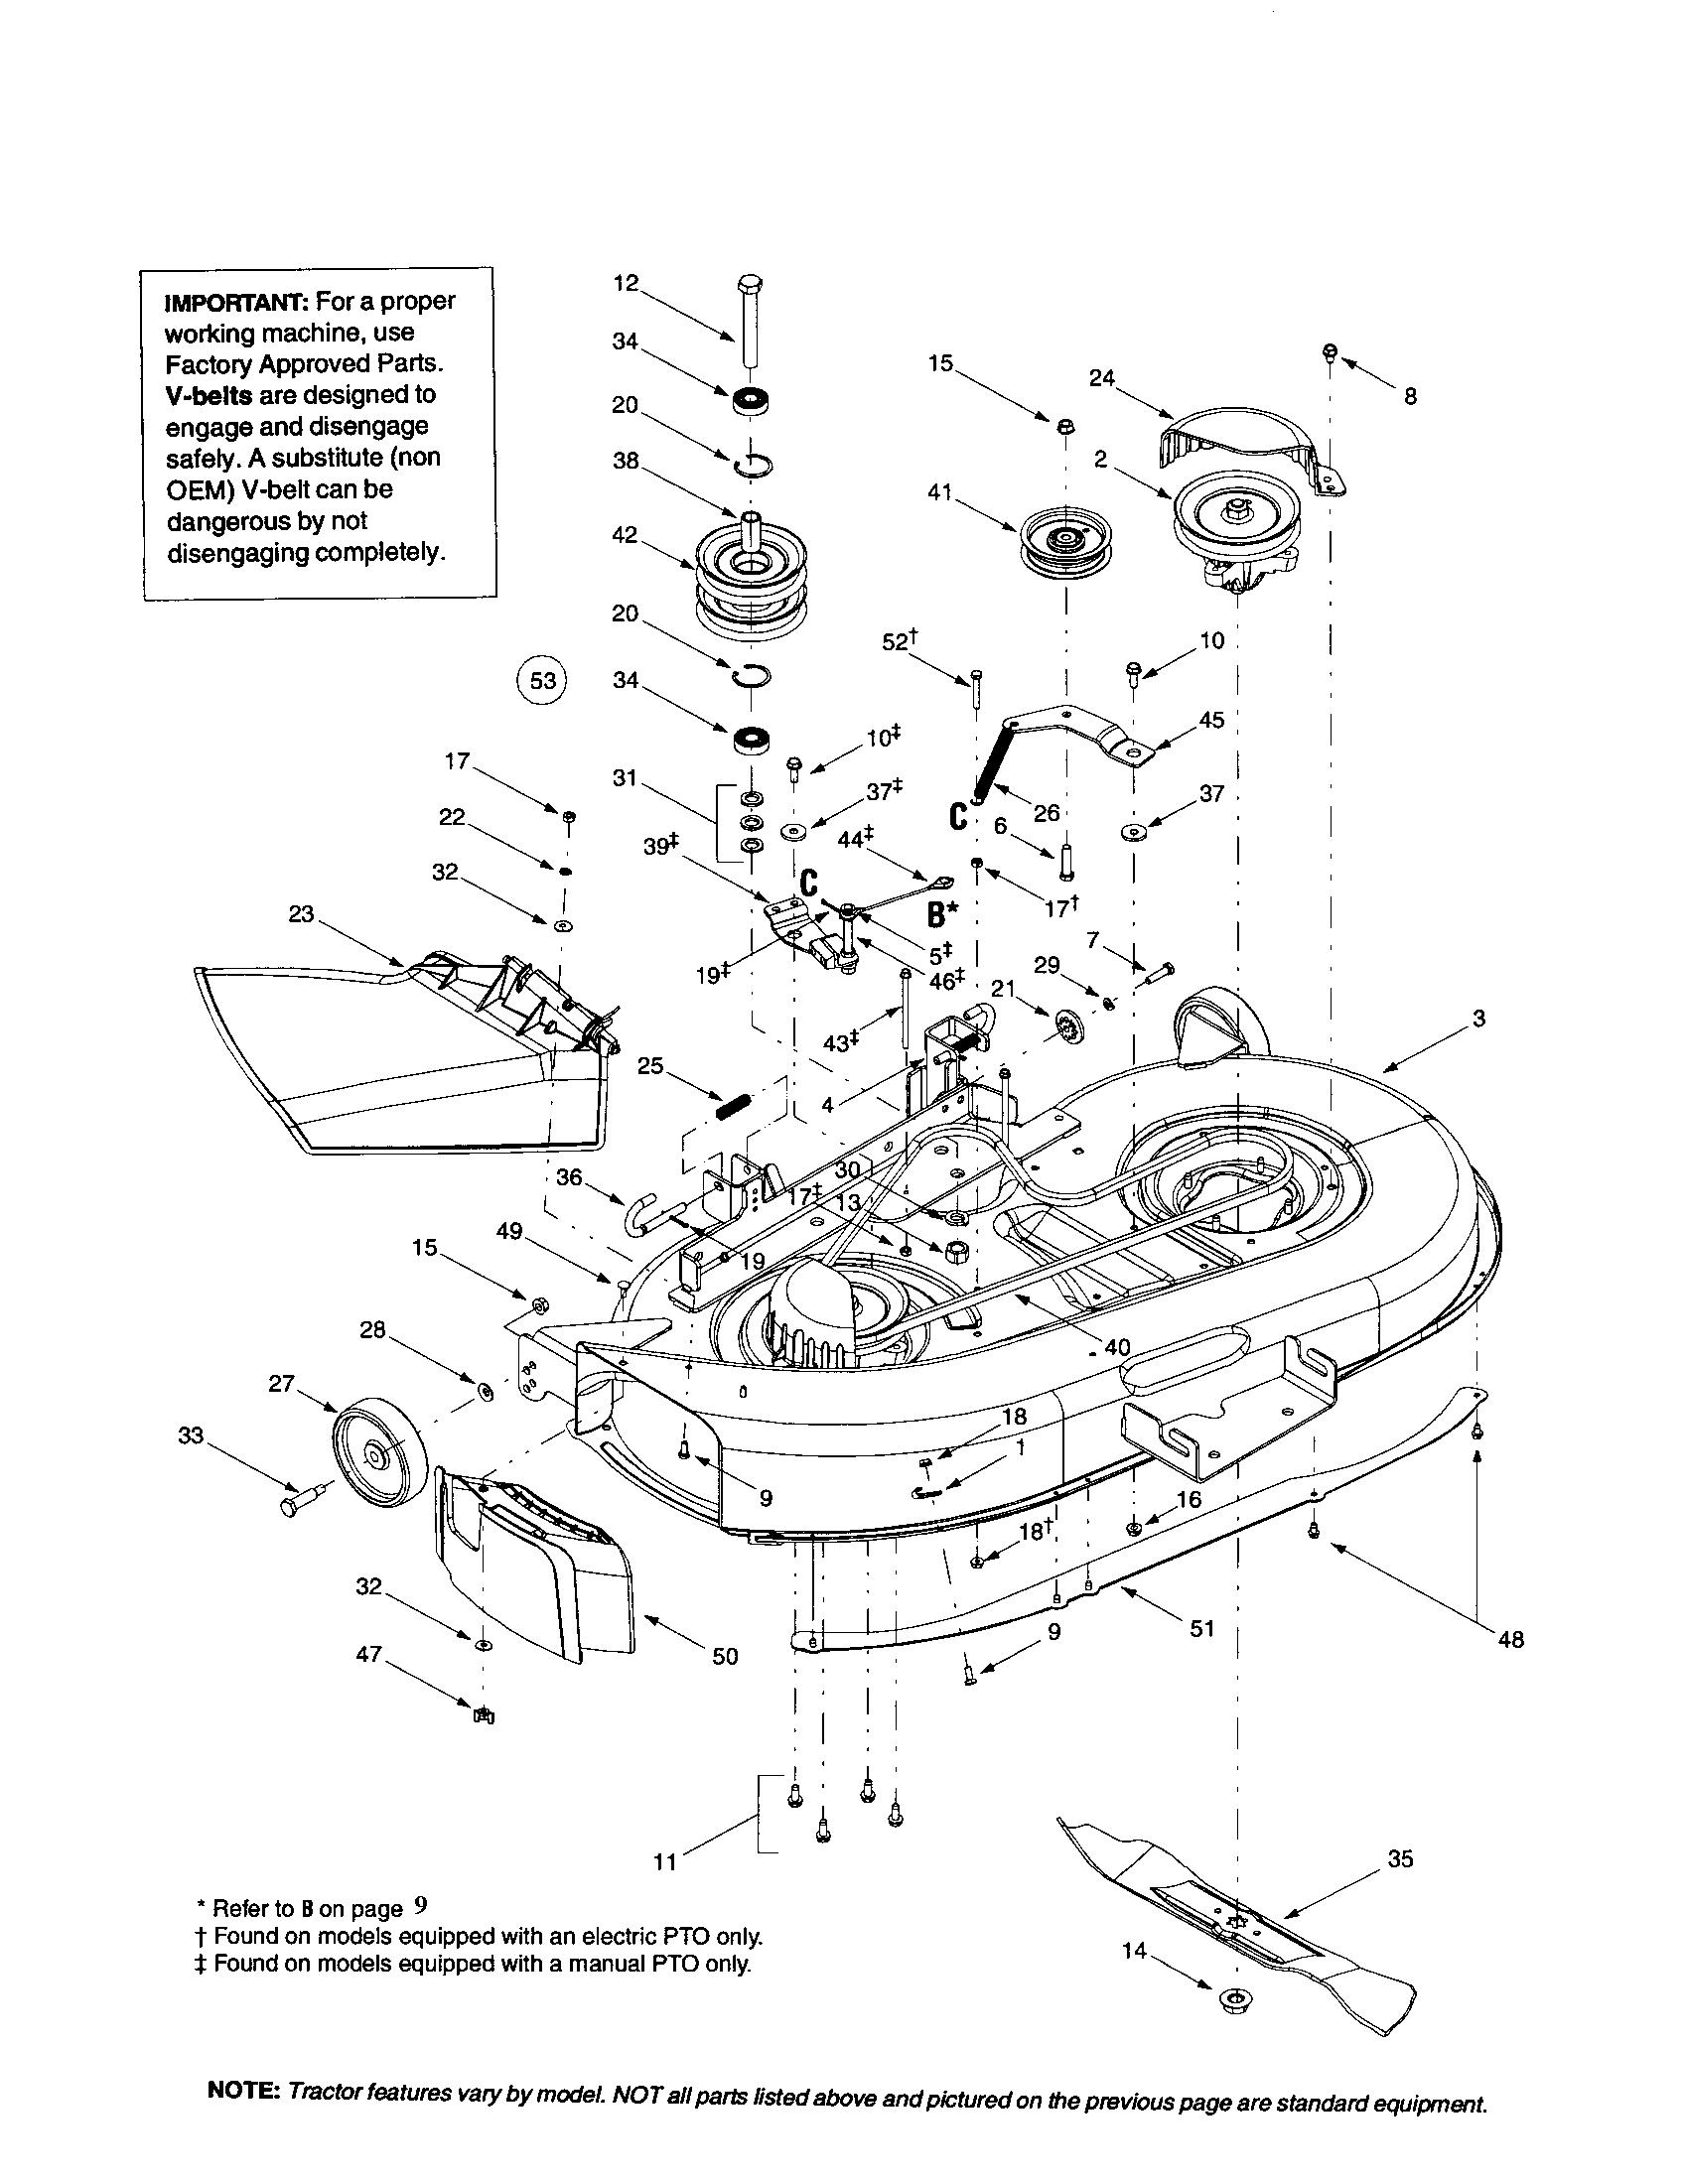 huskee riding mower electrical diagram [ 1696 x 2200 Pixel ]